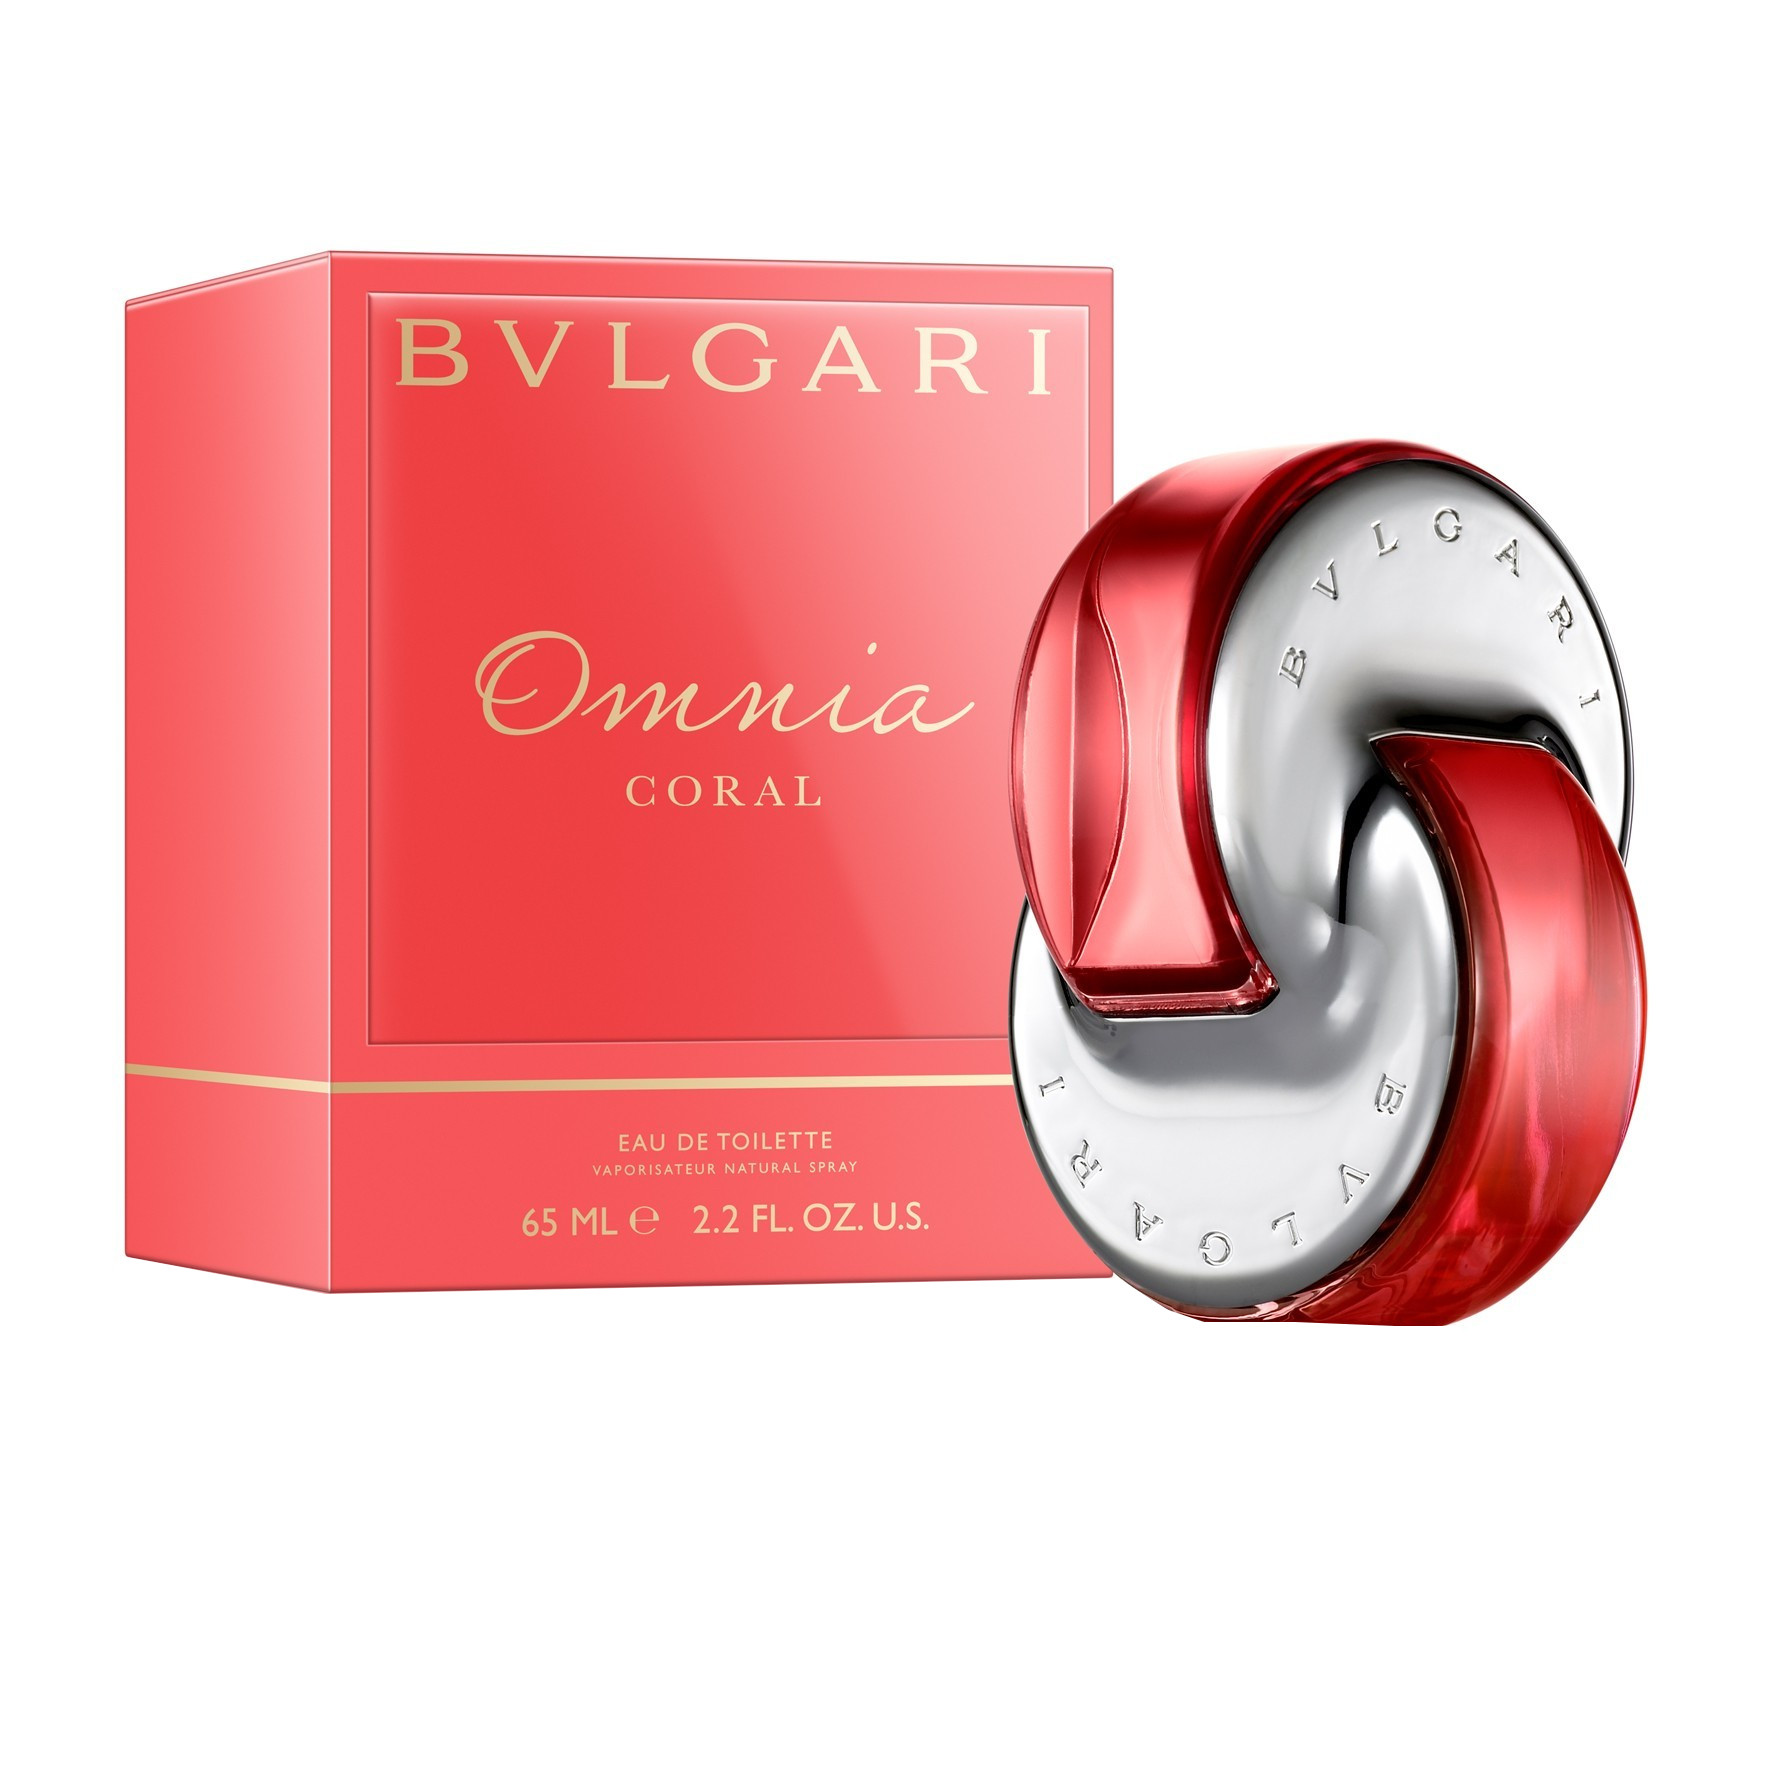 Bvlgari Omnia Coral - toaletní voda W Objem: 65 ml